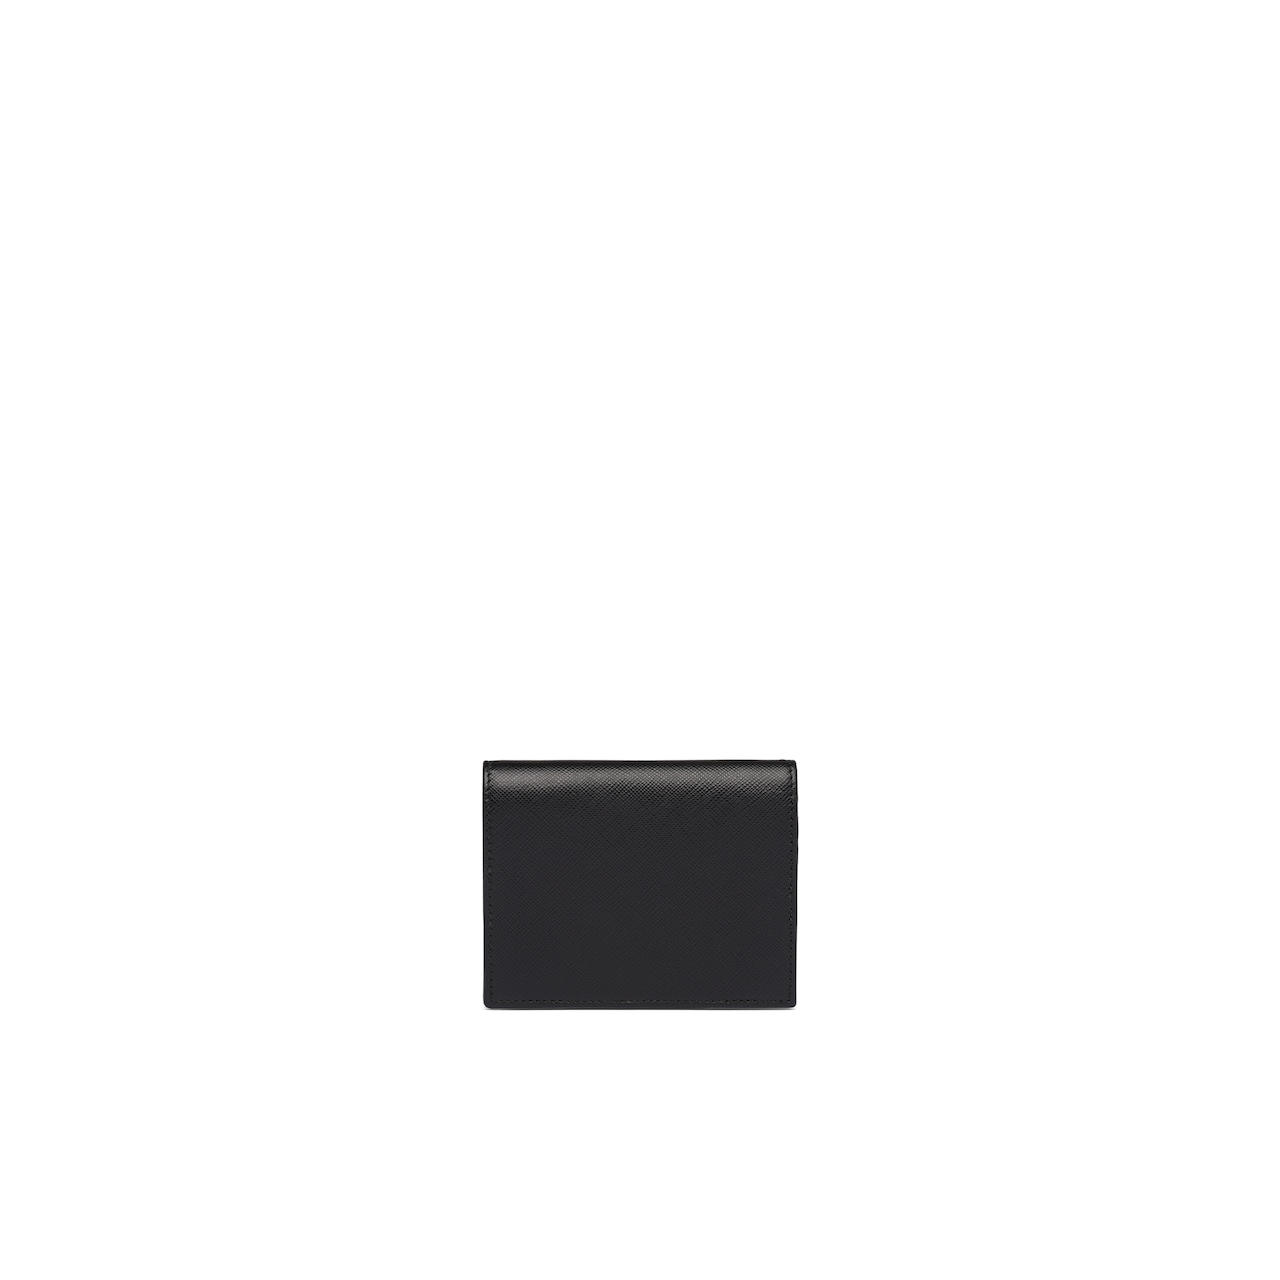 Prada Small Saffiano leather wallet 5